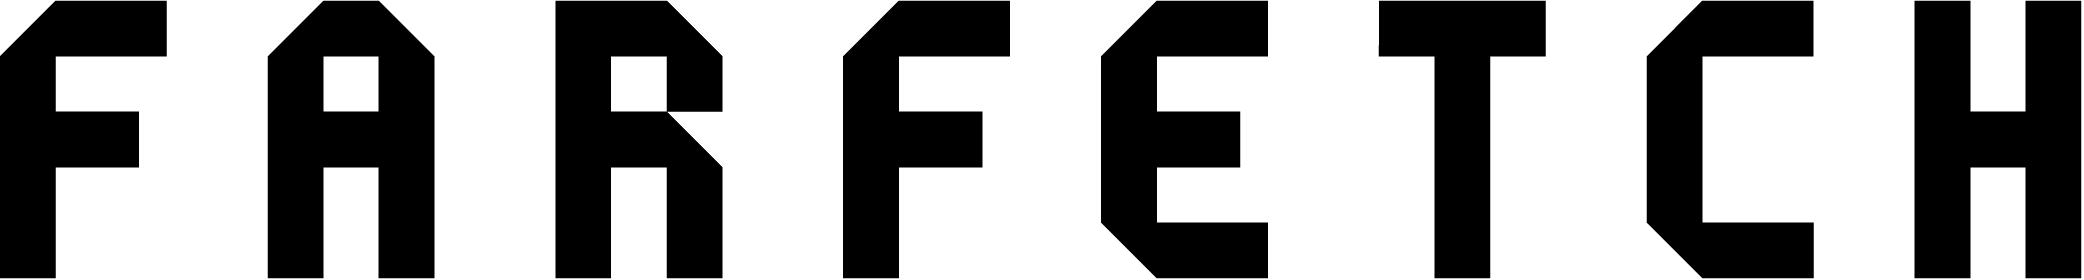 File:Farfetch master logo black.png.